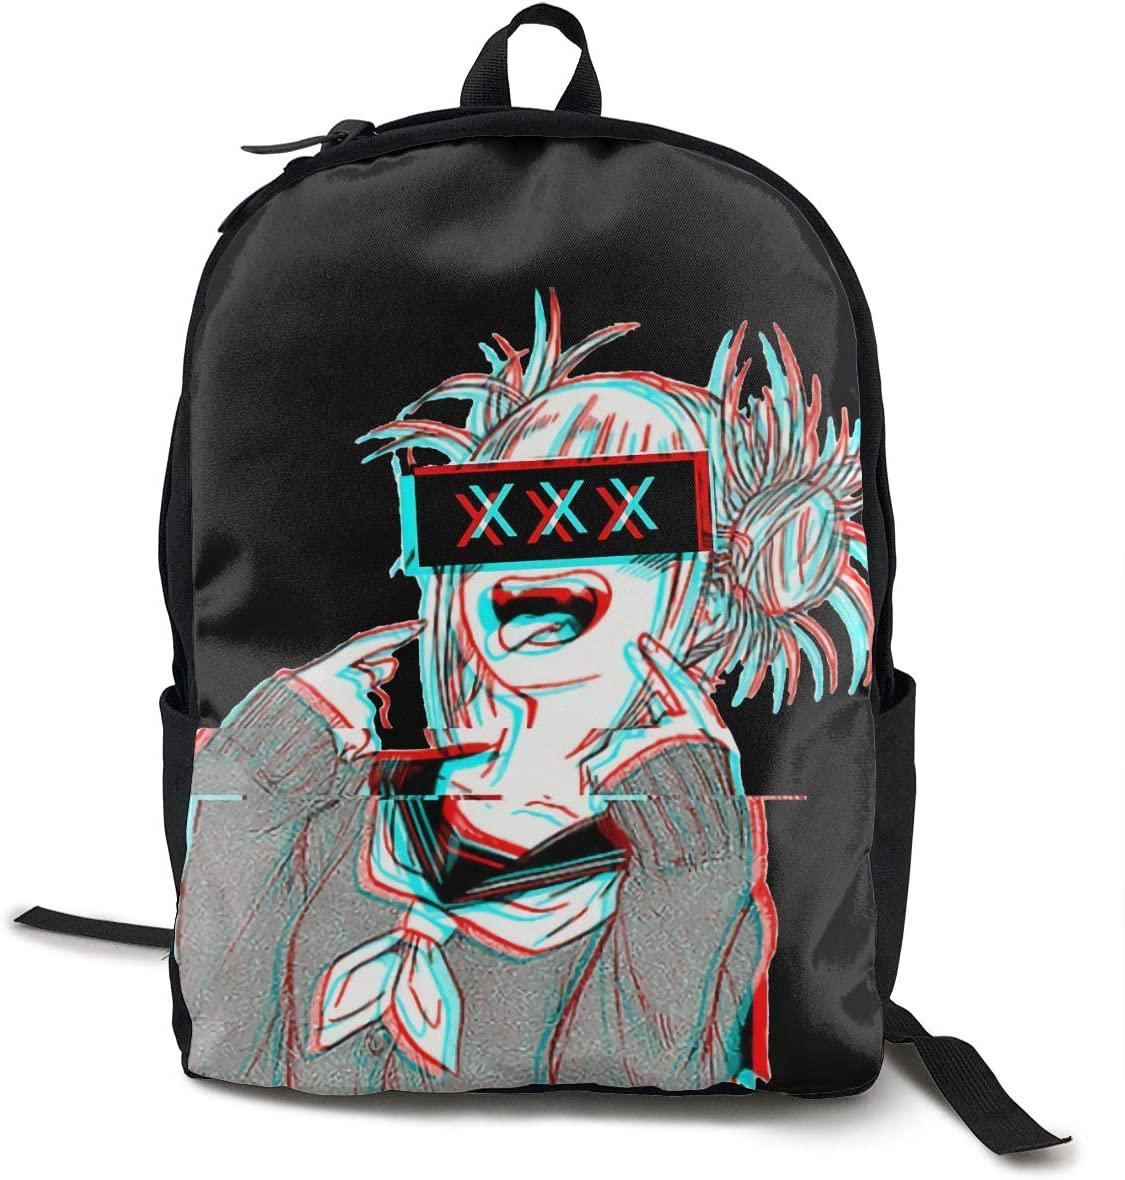 GekhHaon My Hero Academia-Himiko Toga College Backpack Student Bookbag Multipurpose DaypacksTraveling Backpack